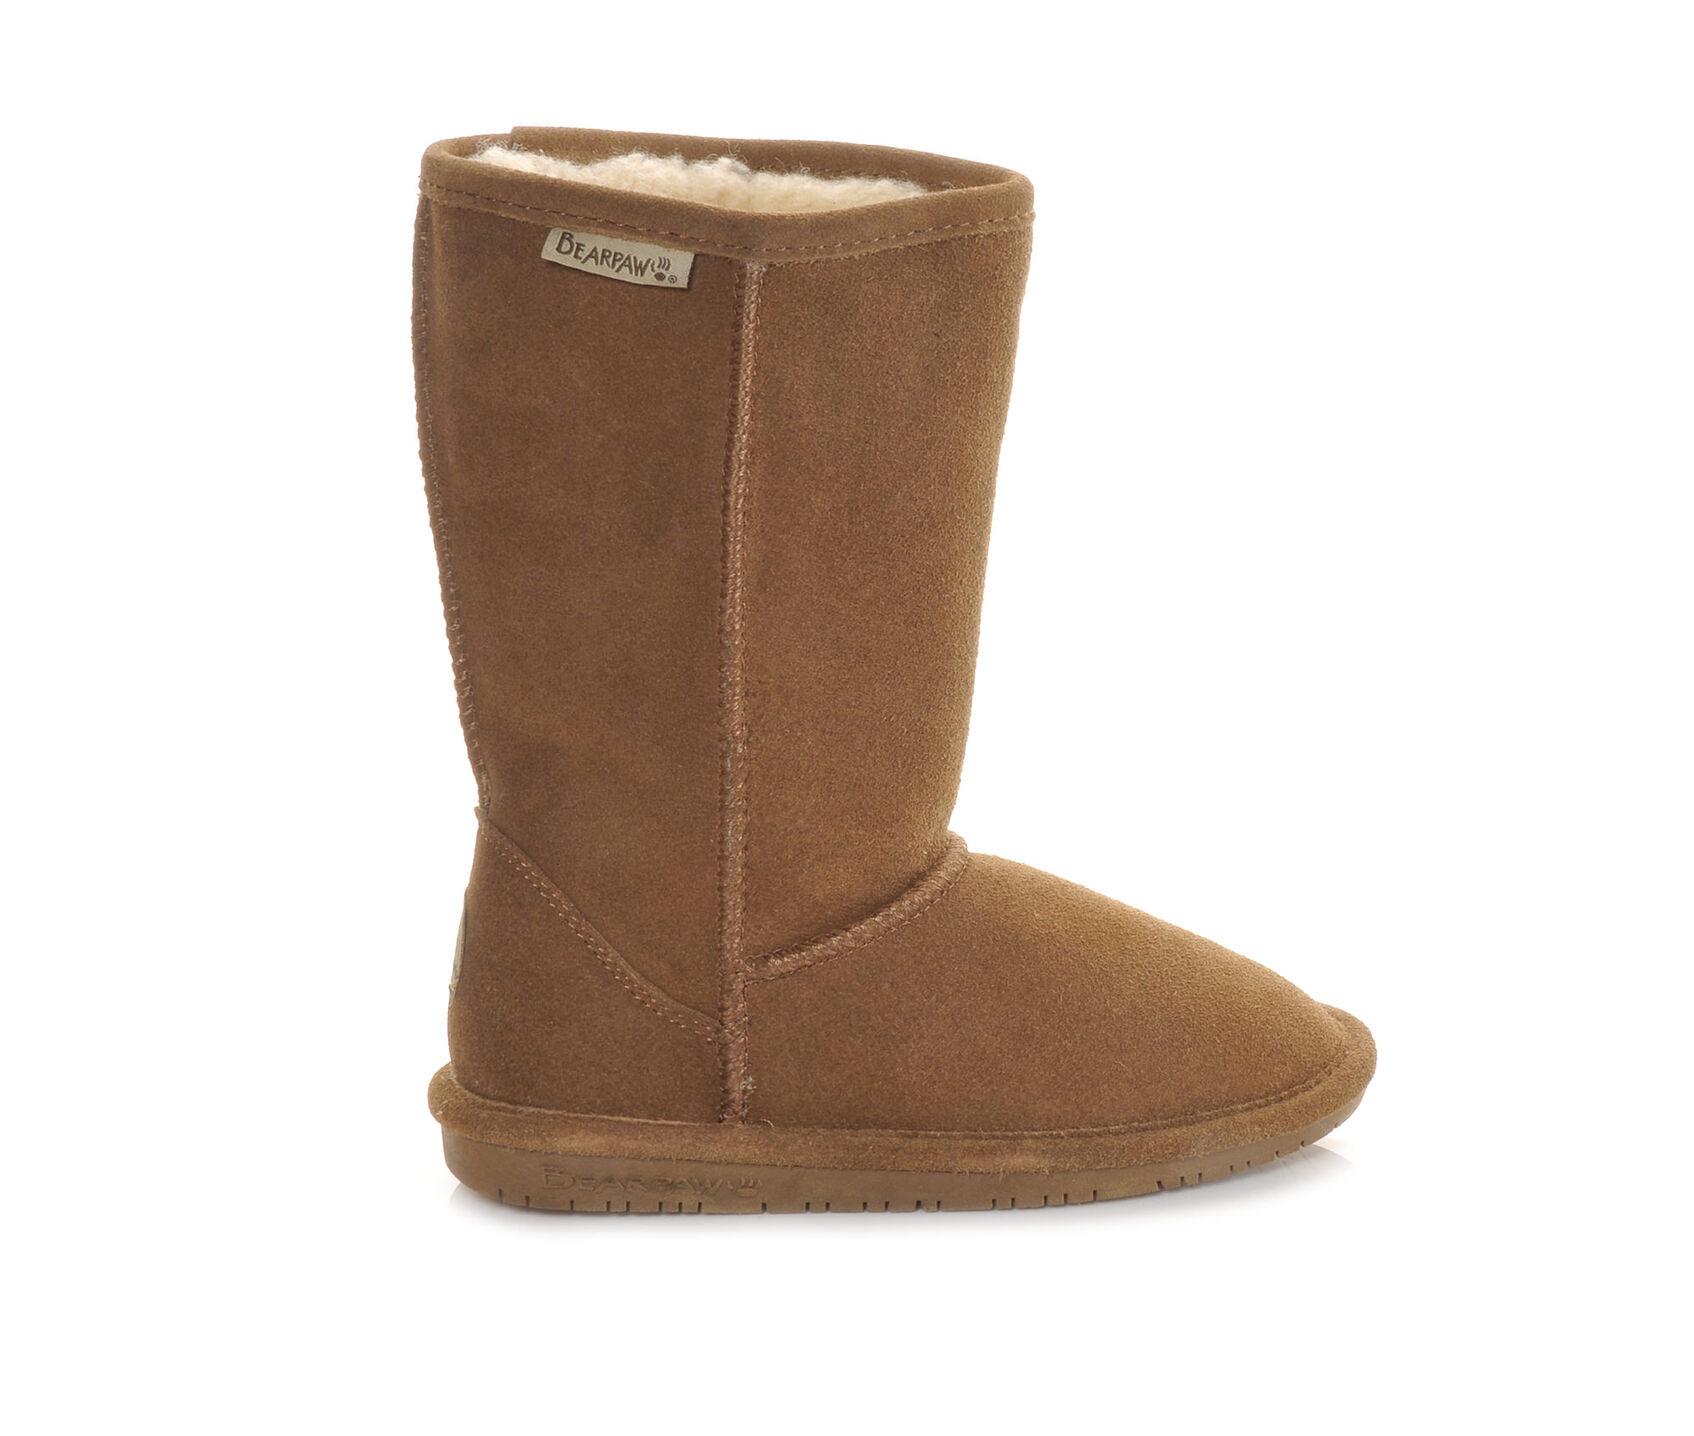 24a66a5e166 Girls' Bearpaw Little Kid & Big Kid Emma Tall Boots